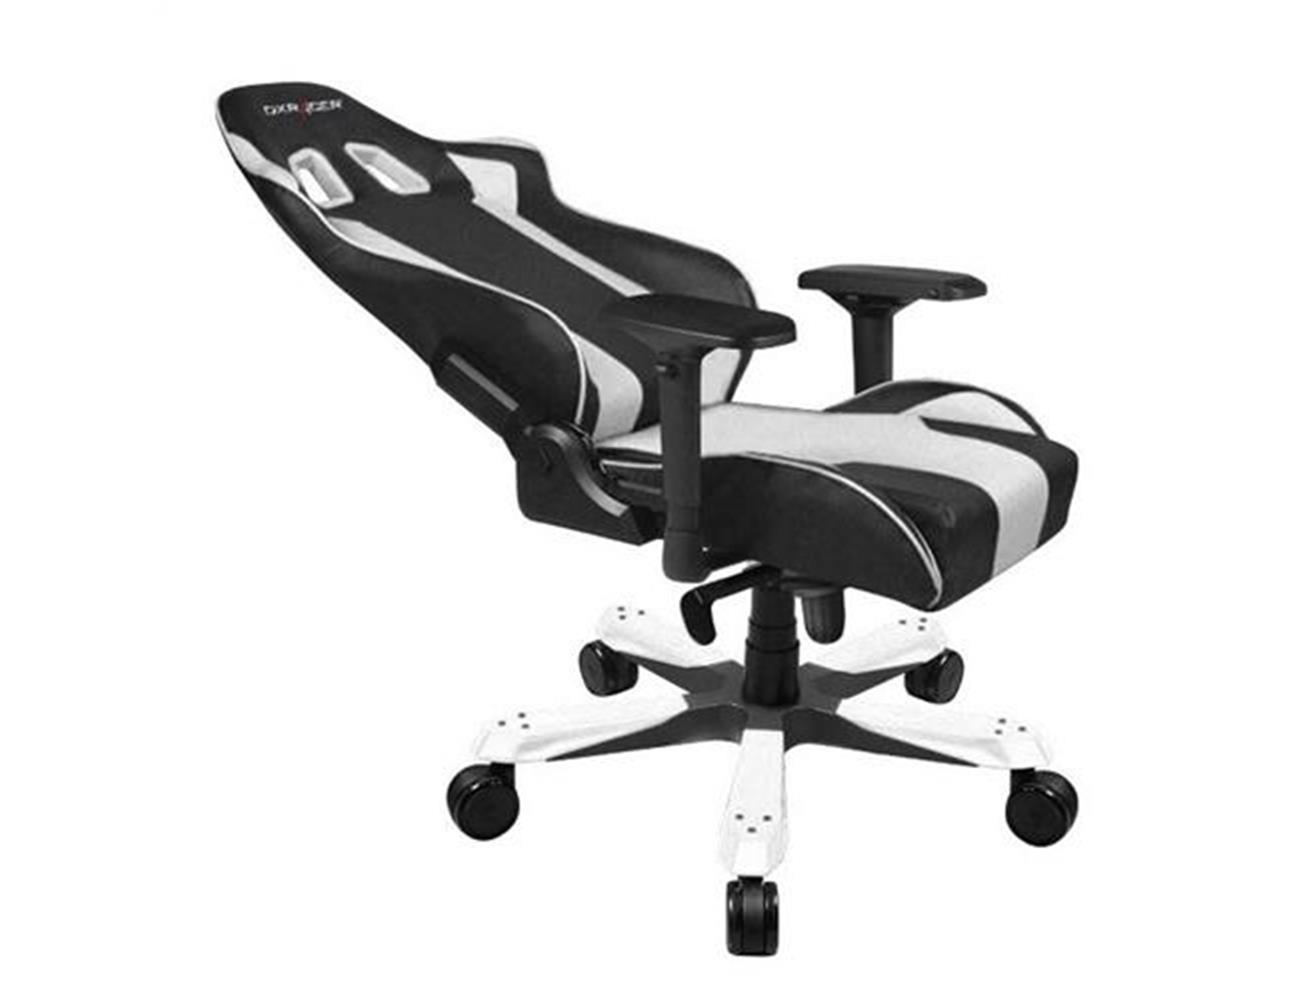 DXRacer King Series Gaming Chair - Black/White| Blink Saudi